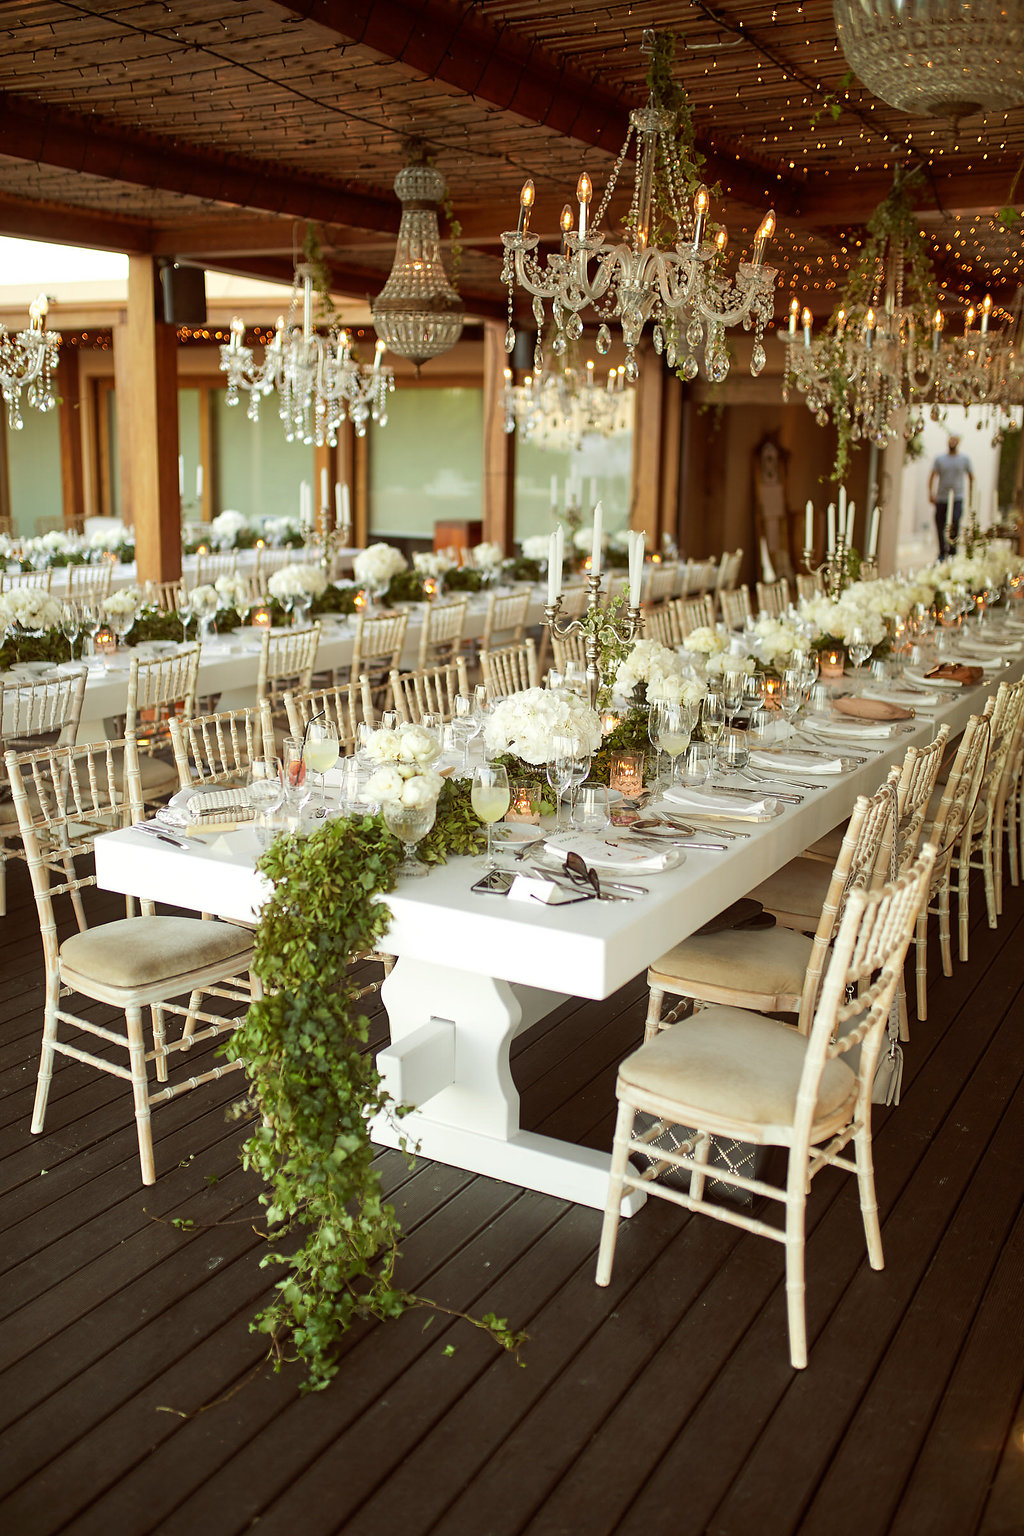 romantic wedding receptions - photo by Sotiris Tsakanikas https://ruffledblog.com/chic-sunset-wedding-on-the-athens-riviera